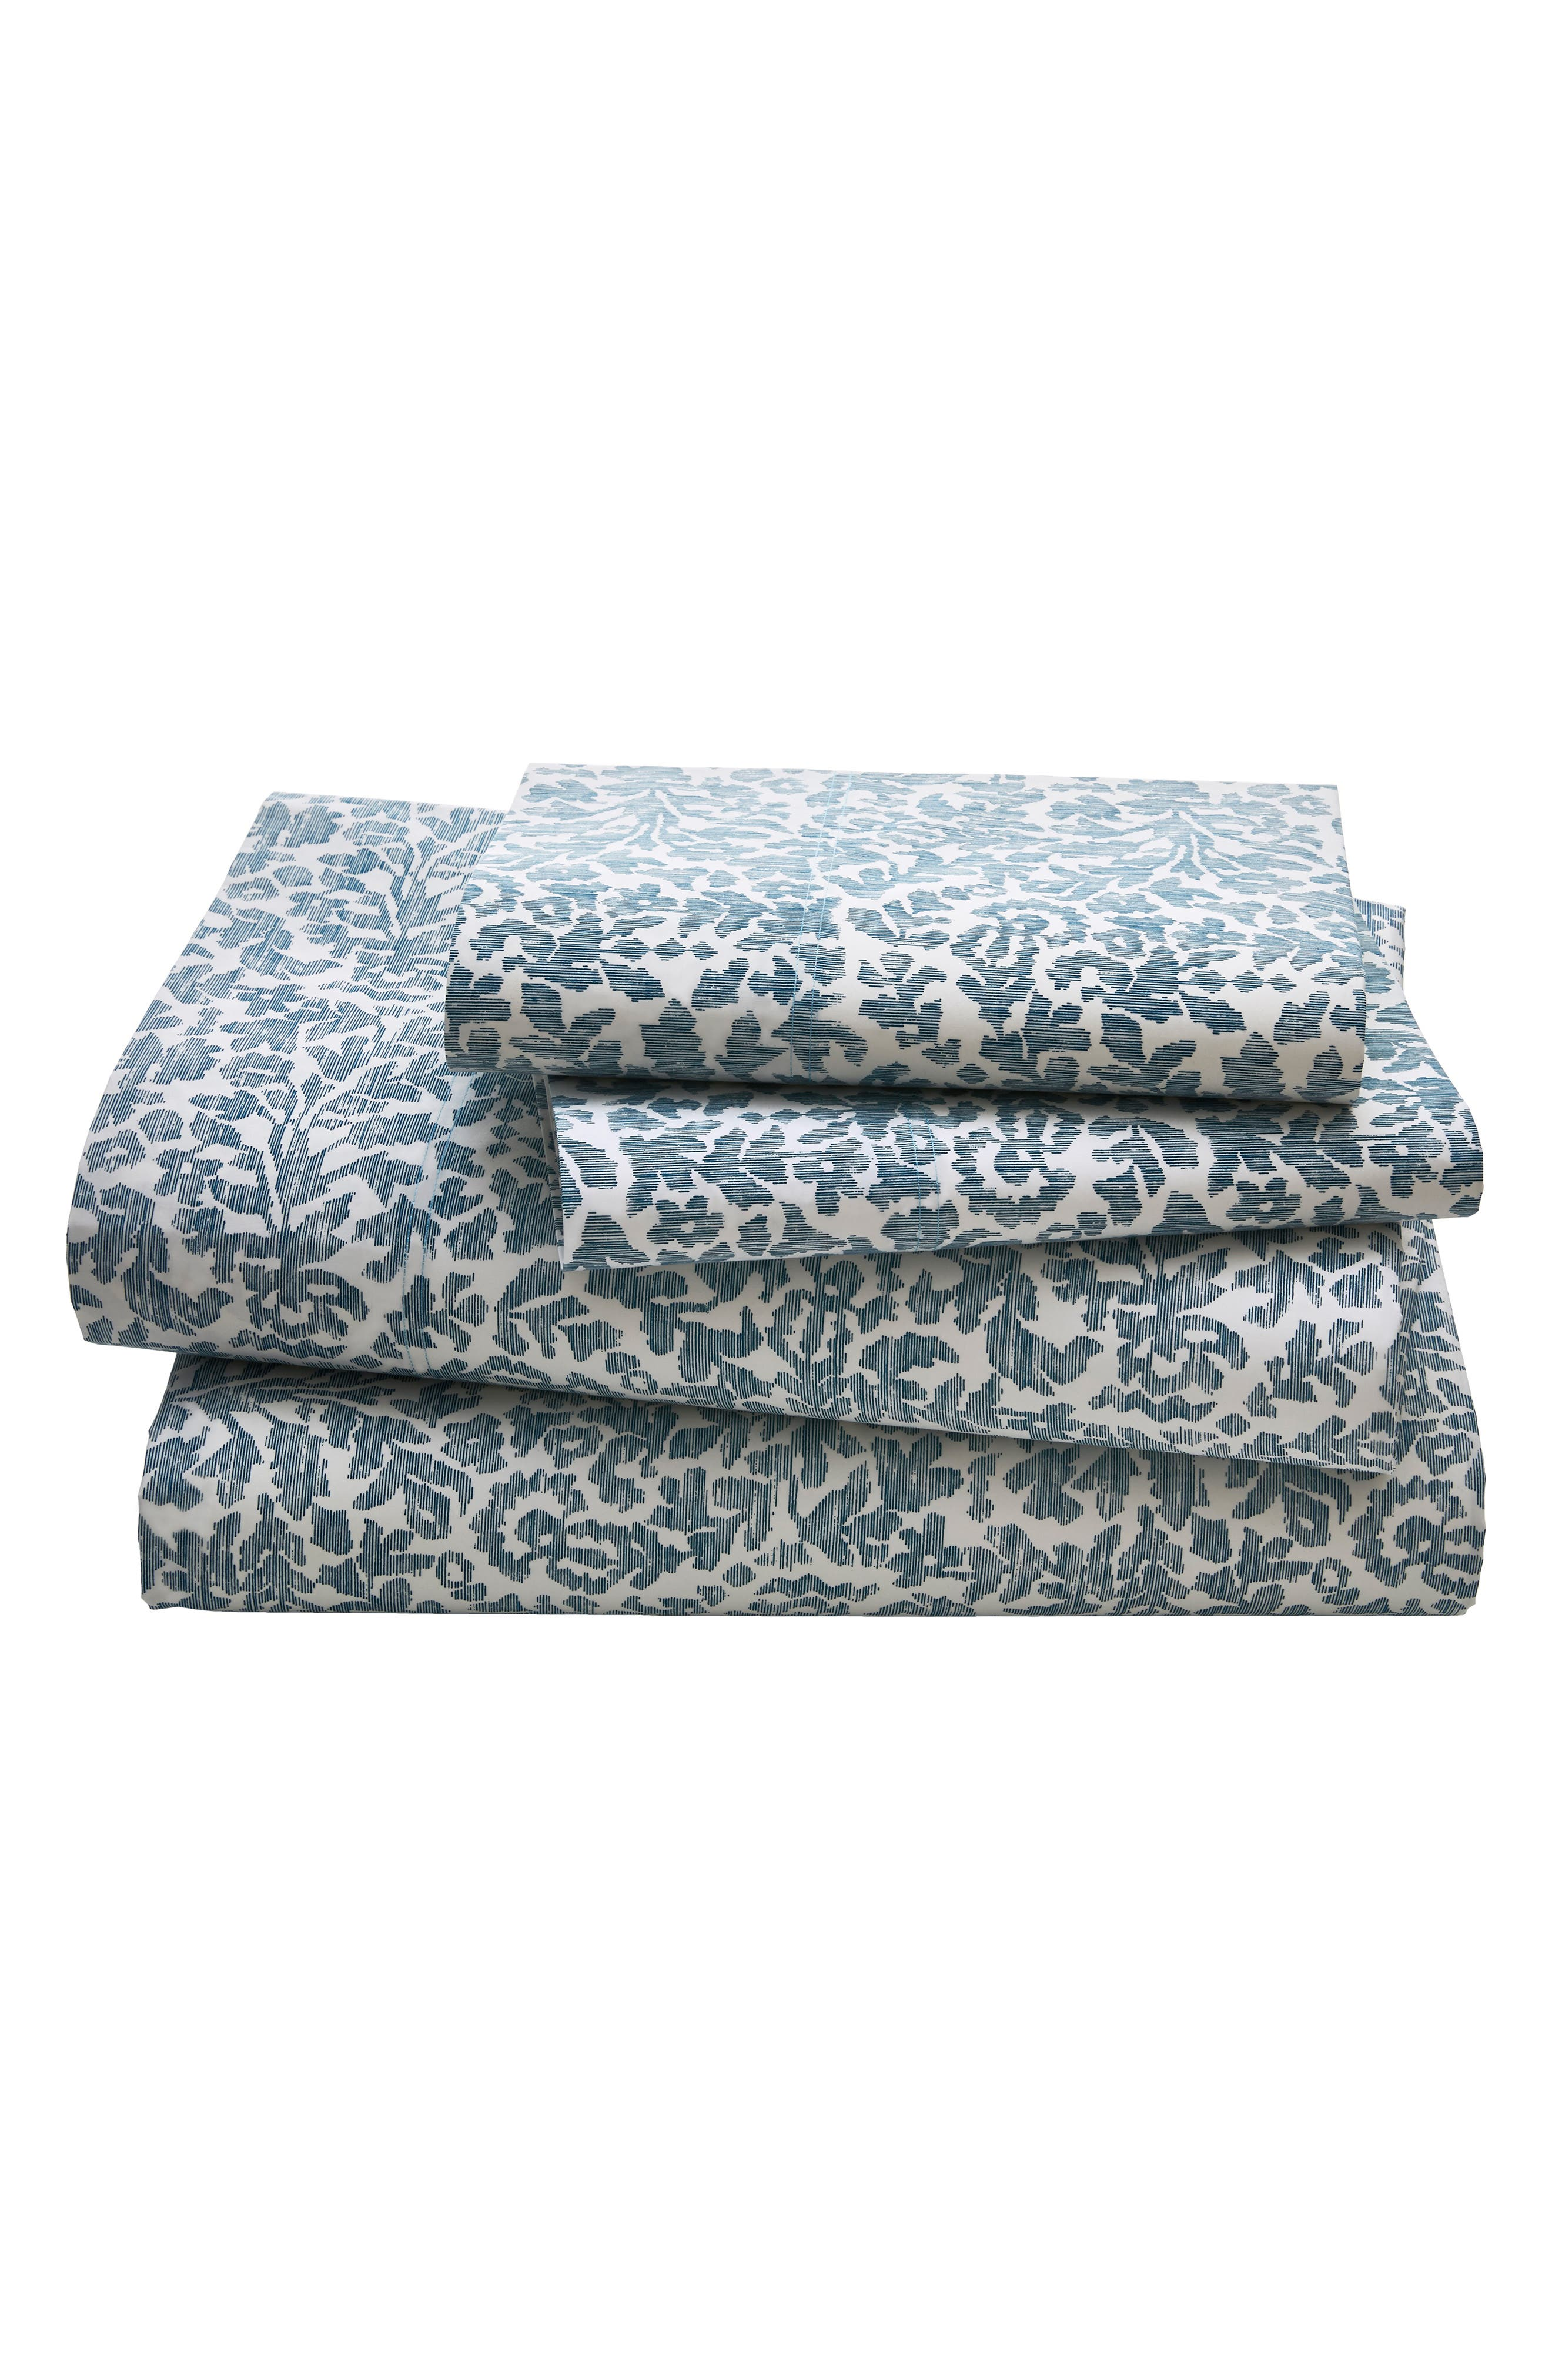 Oaxaca 300 Thread Count Sheet Set,                             Main thumbnail 1, color,                             Azure/ Turquoise/ Aqua